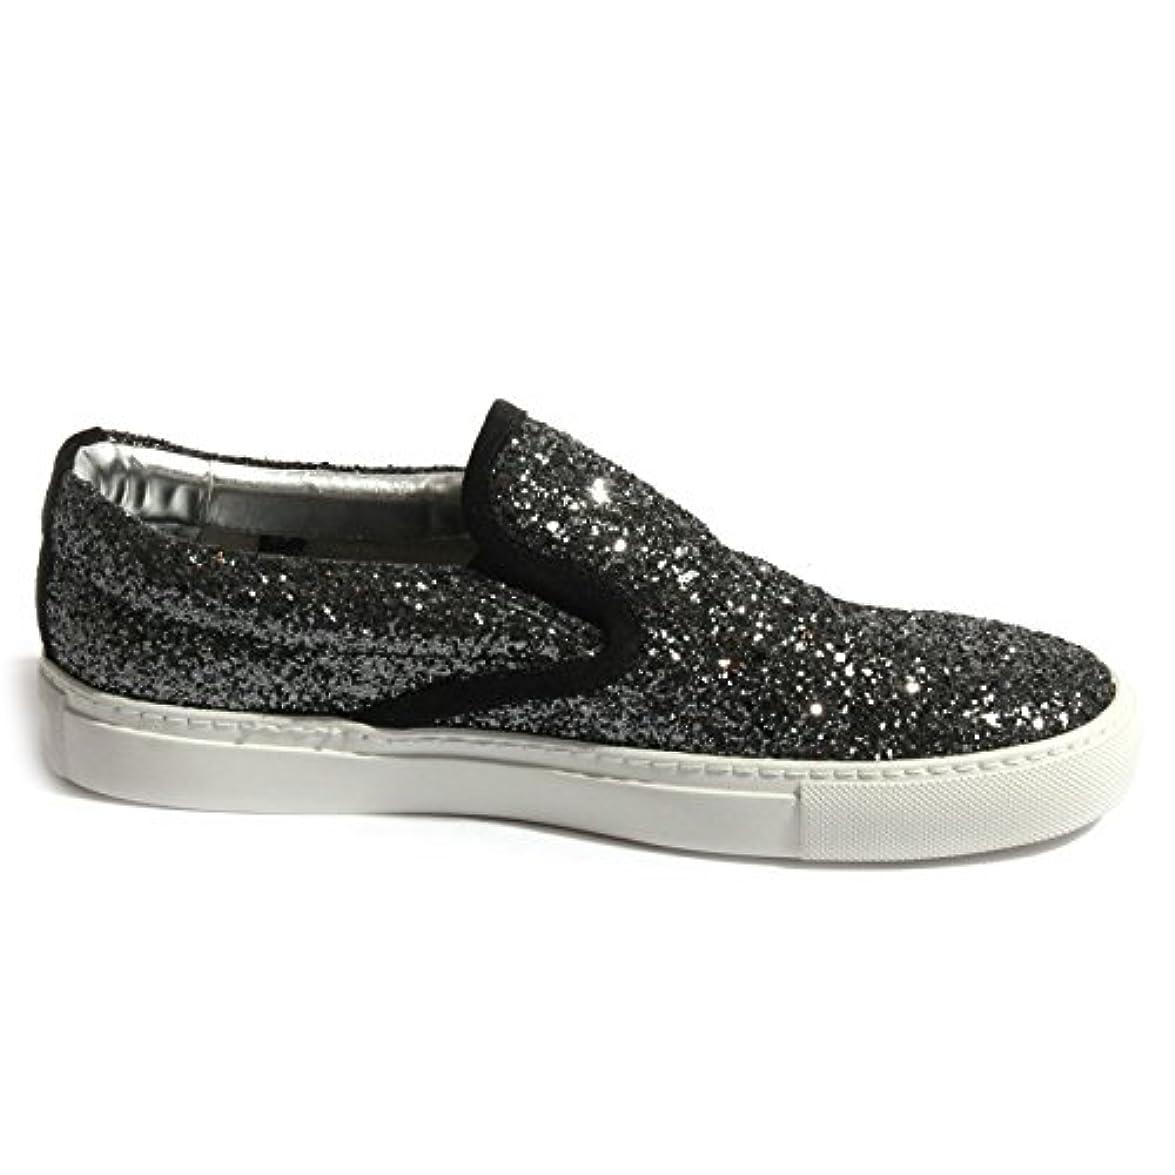 B0417 Sneaker Donna P448 E5 Slipon Scarpa Nera Glitter Shoes Women